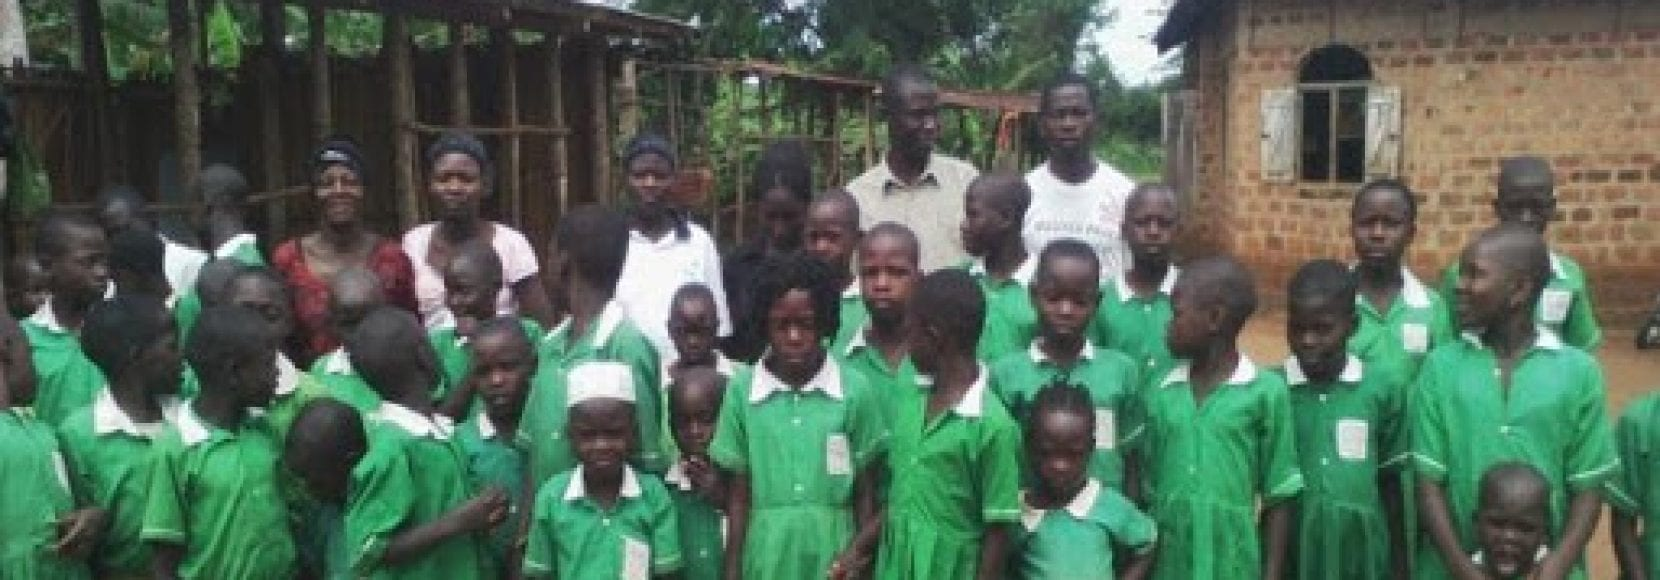 Group of kids and teachers in Uganda